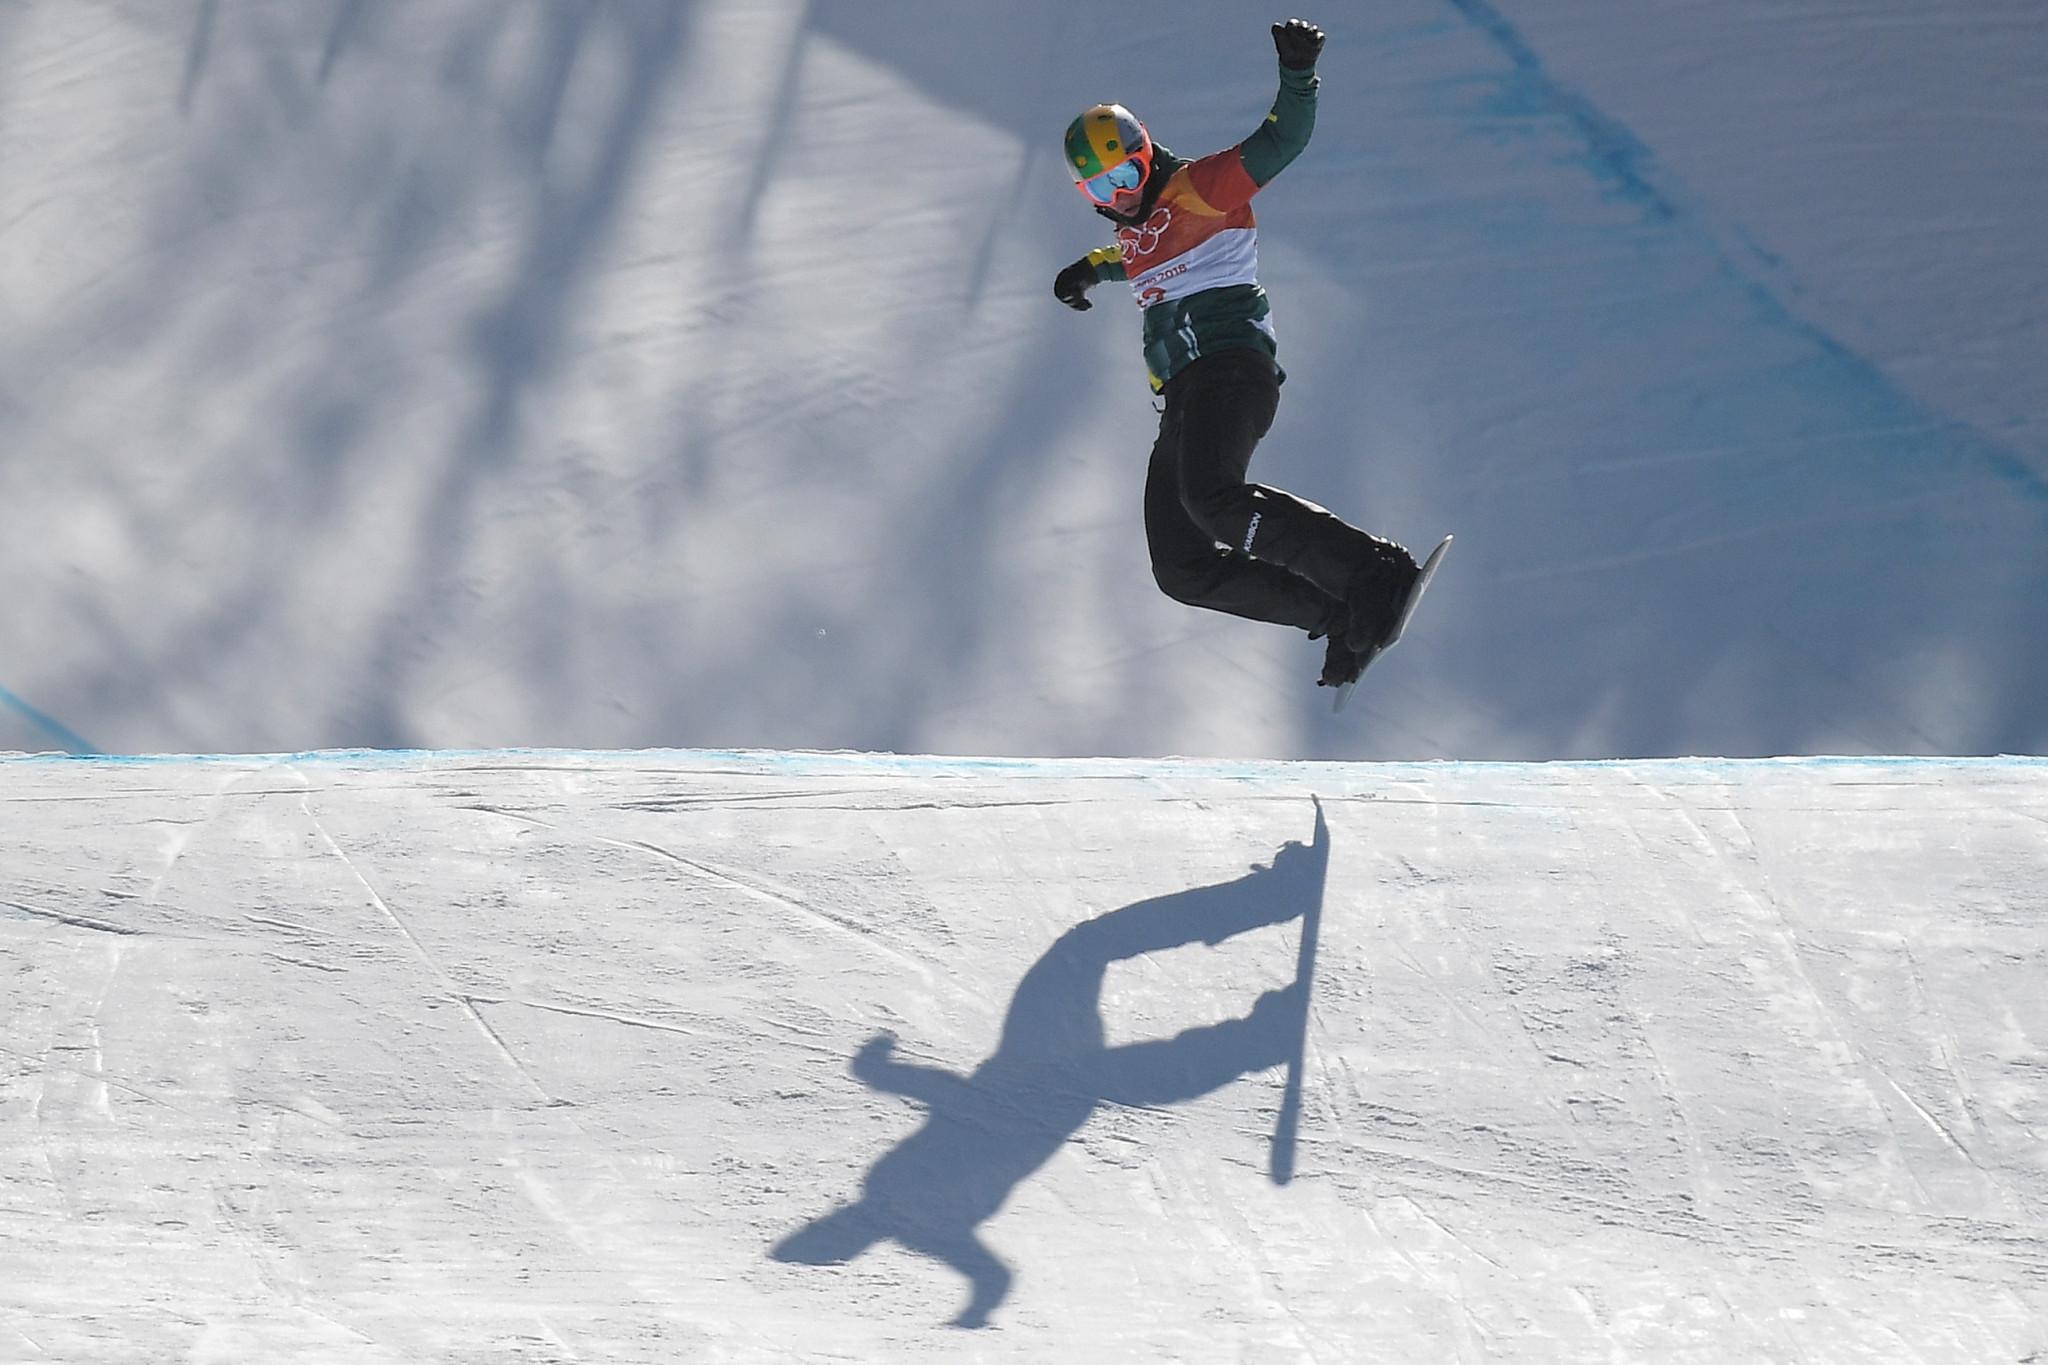 Pyeongchang 2018 silver medallist participates at snowboard cross festival in Australia